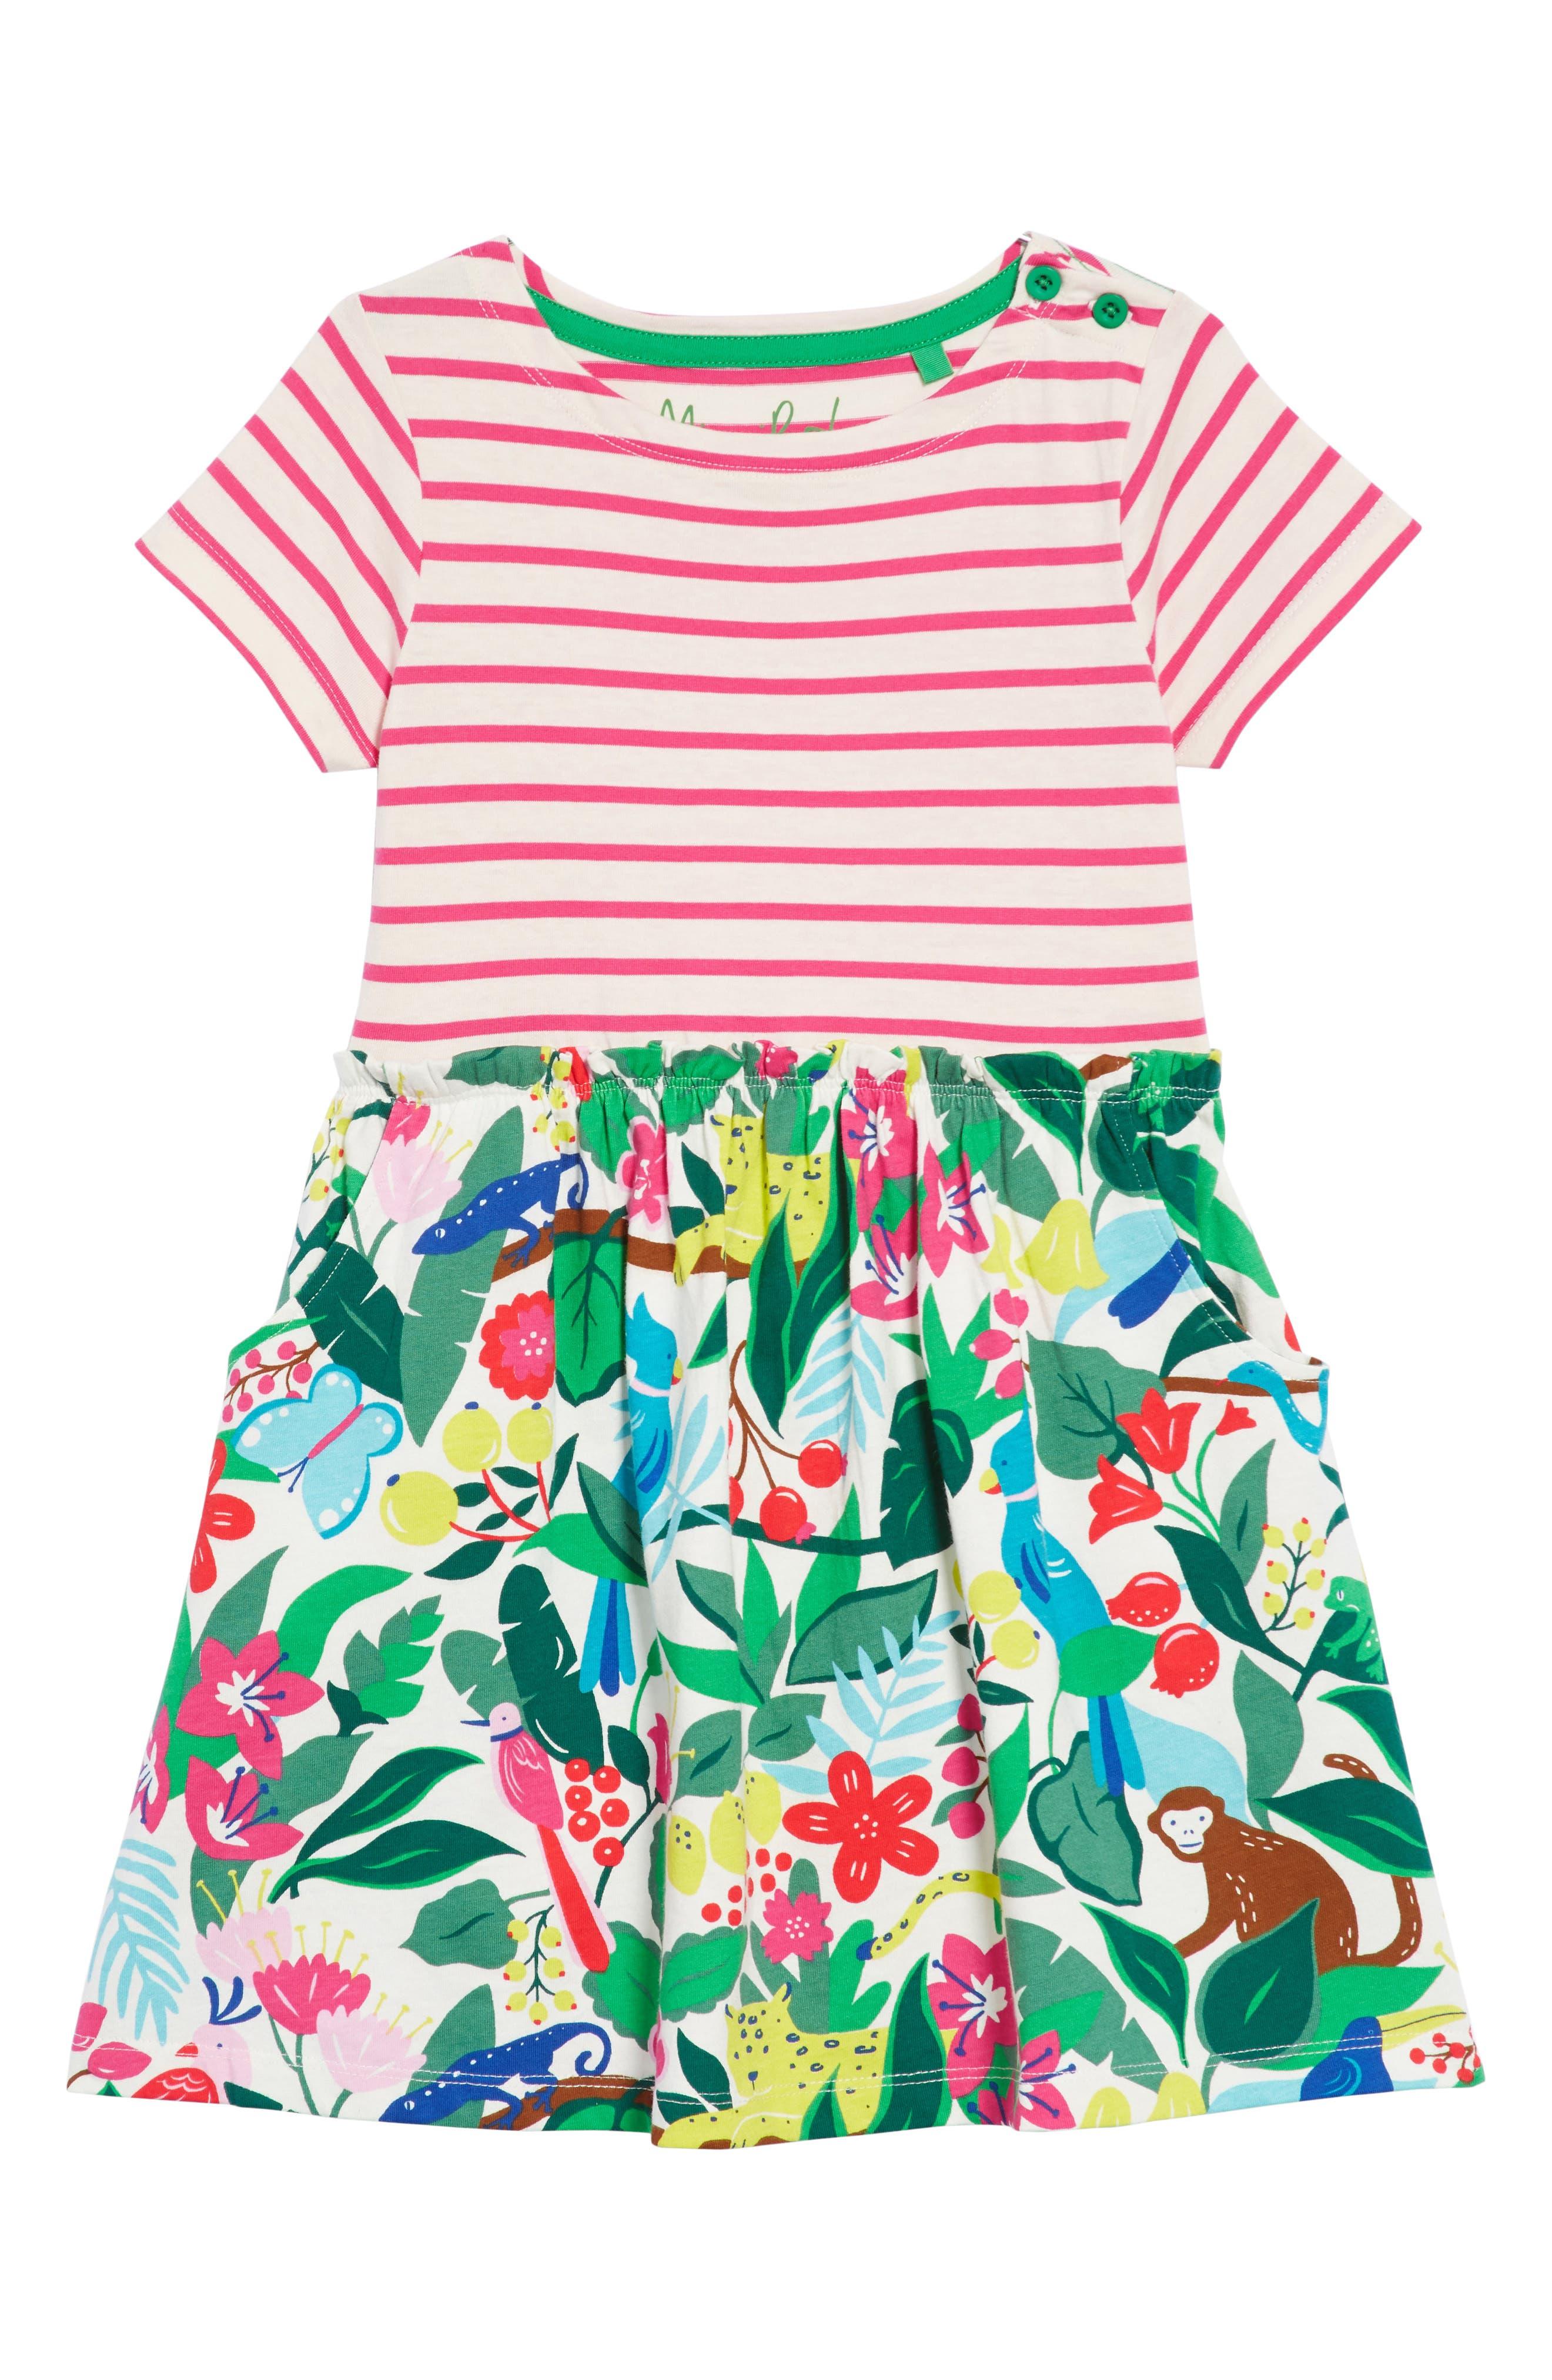 MINI BODEN,                             Bright Hotchpotch Jersey Dress,                             Main thumbnail 1, color,                             901